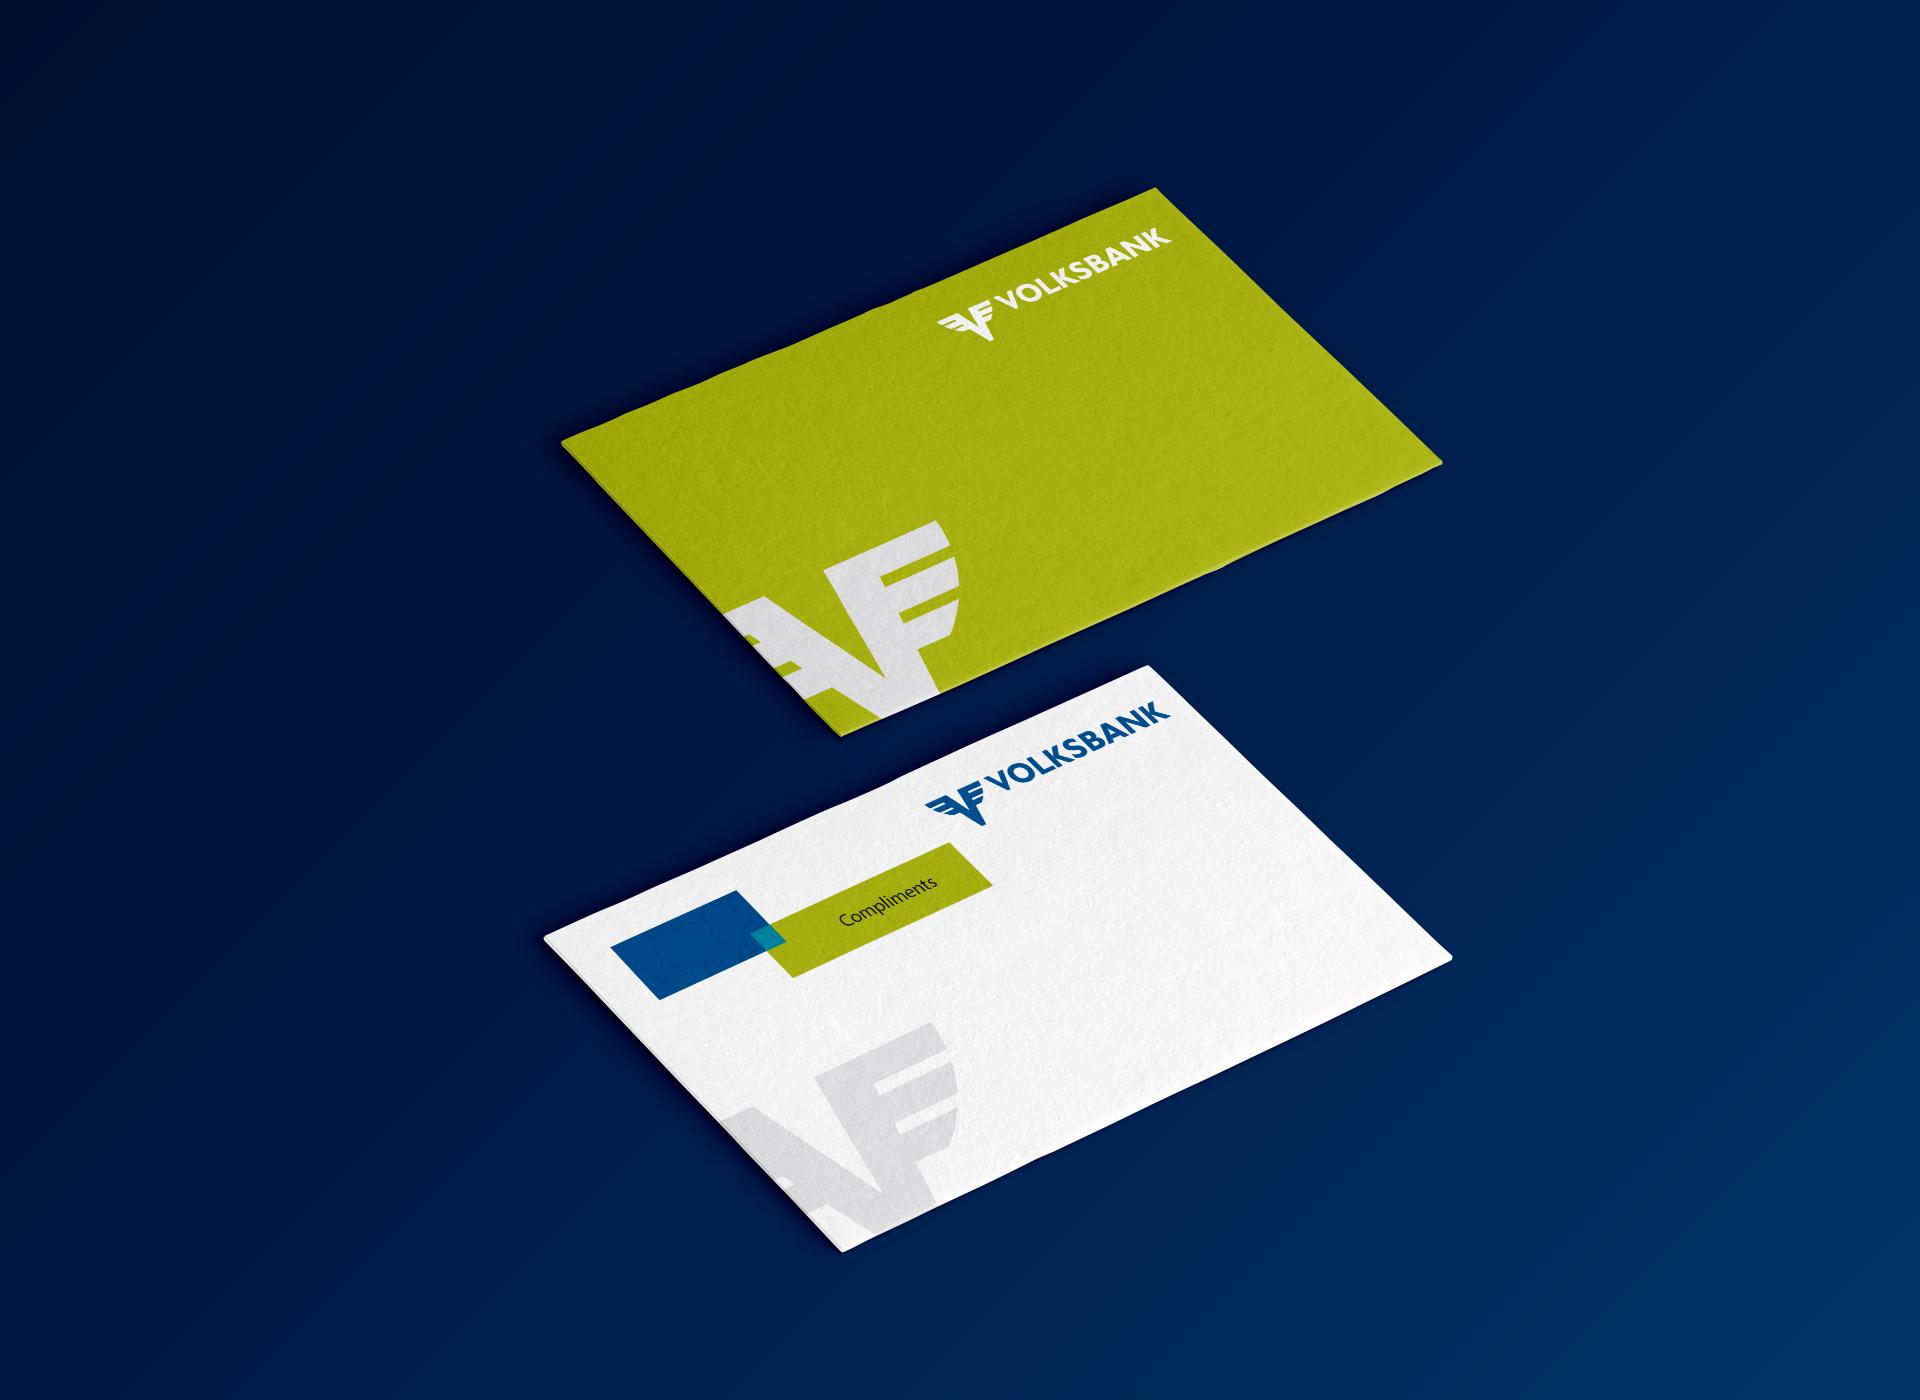 volksbank greeting card portofoliu inoveo